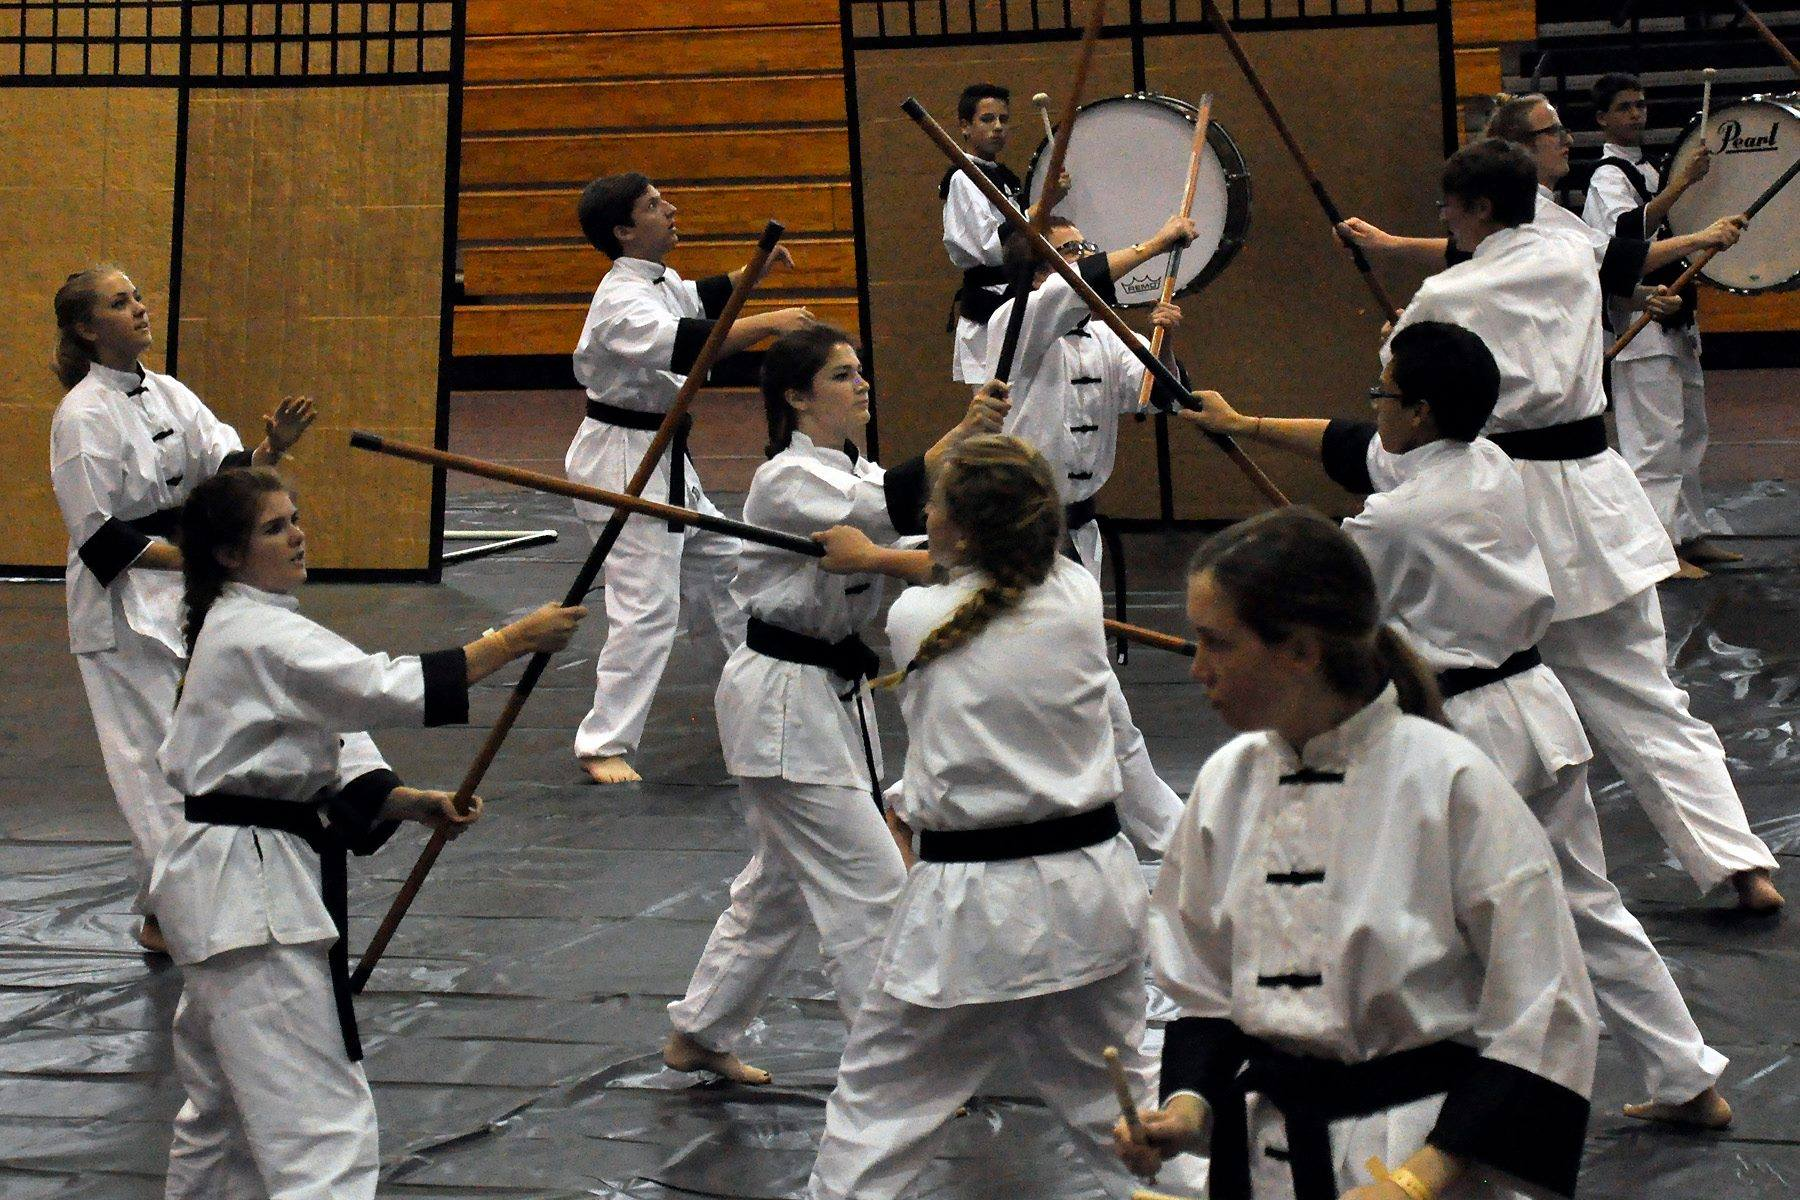 WGI Boca Raton Regional at John I Leonard HS - February 28, 2015